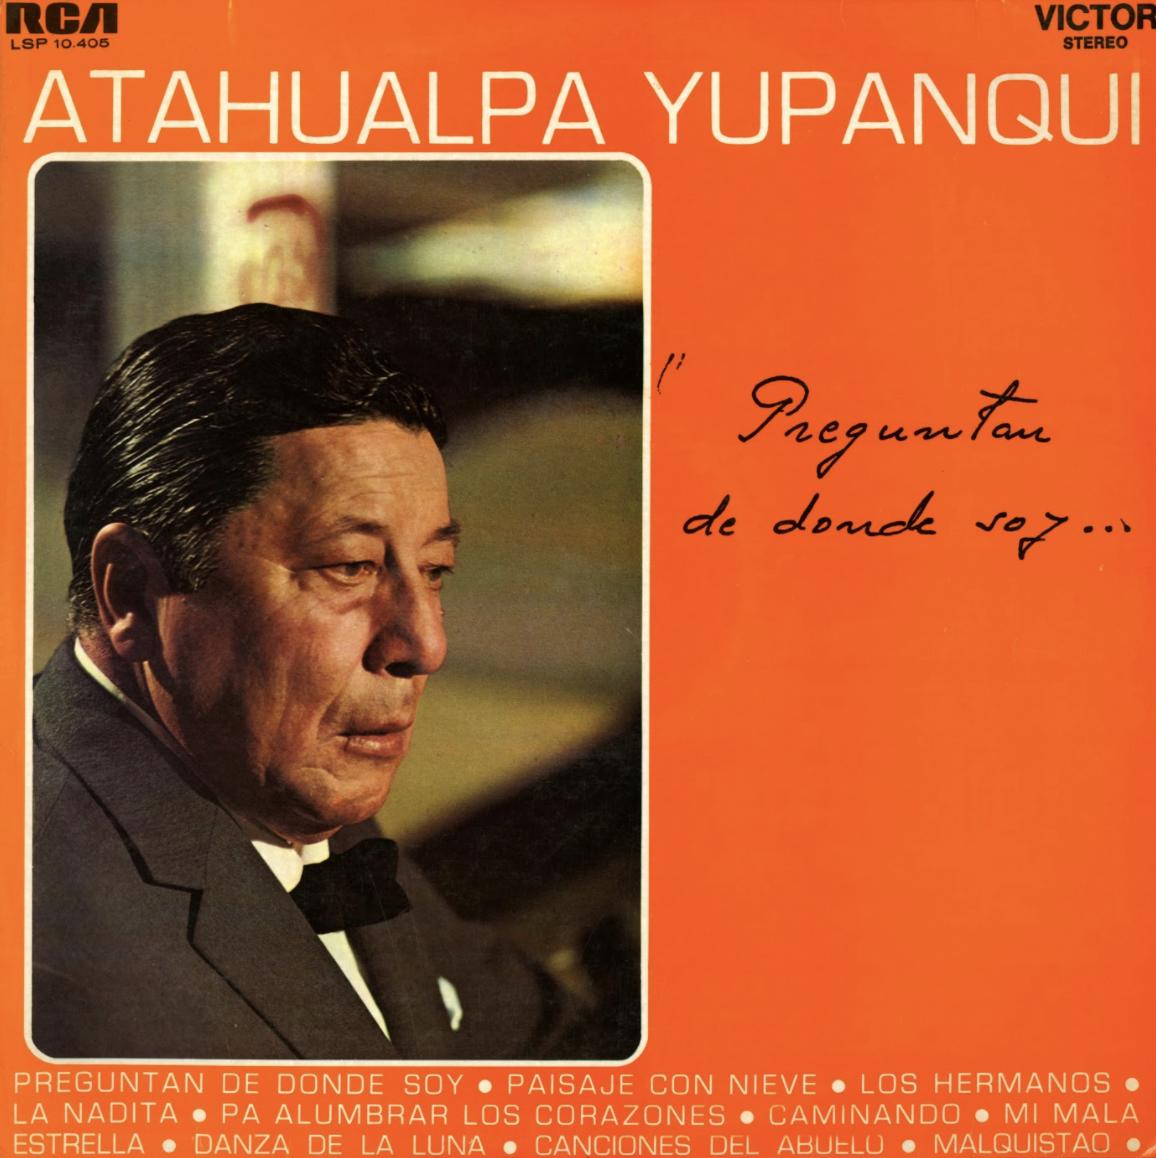 atahualpa yupanqui printemps de bourges